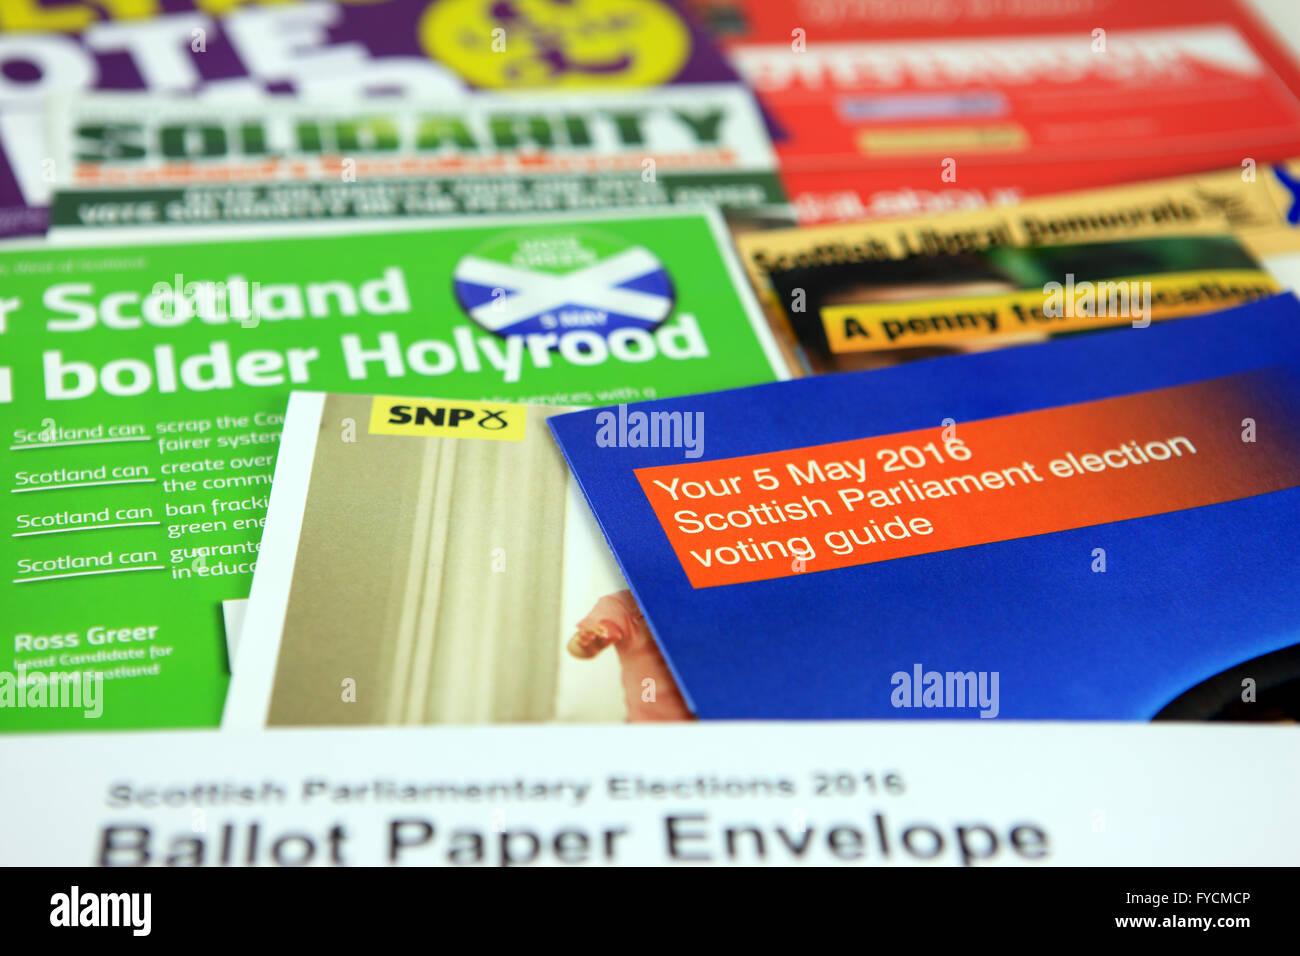 Scottish Parliamentary Elections 2016 leaflets - Stock Image